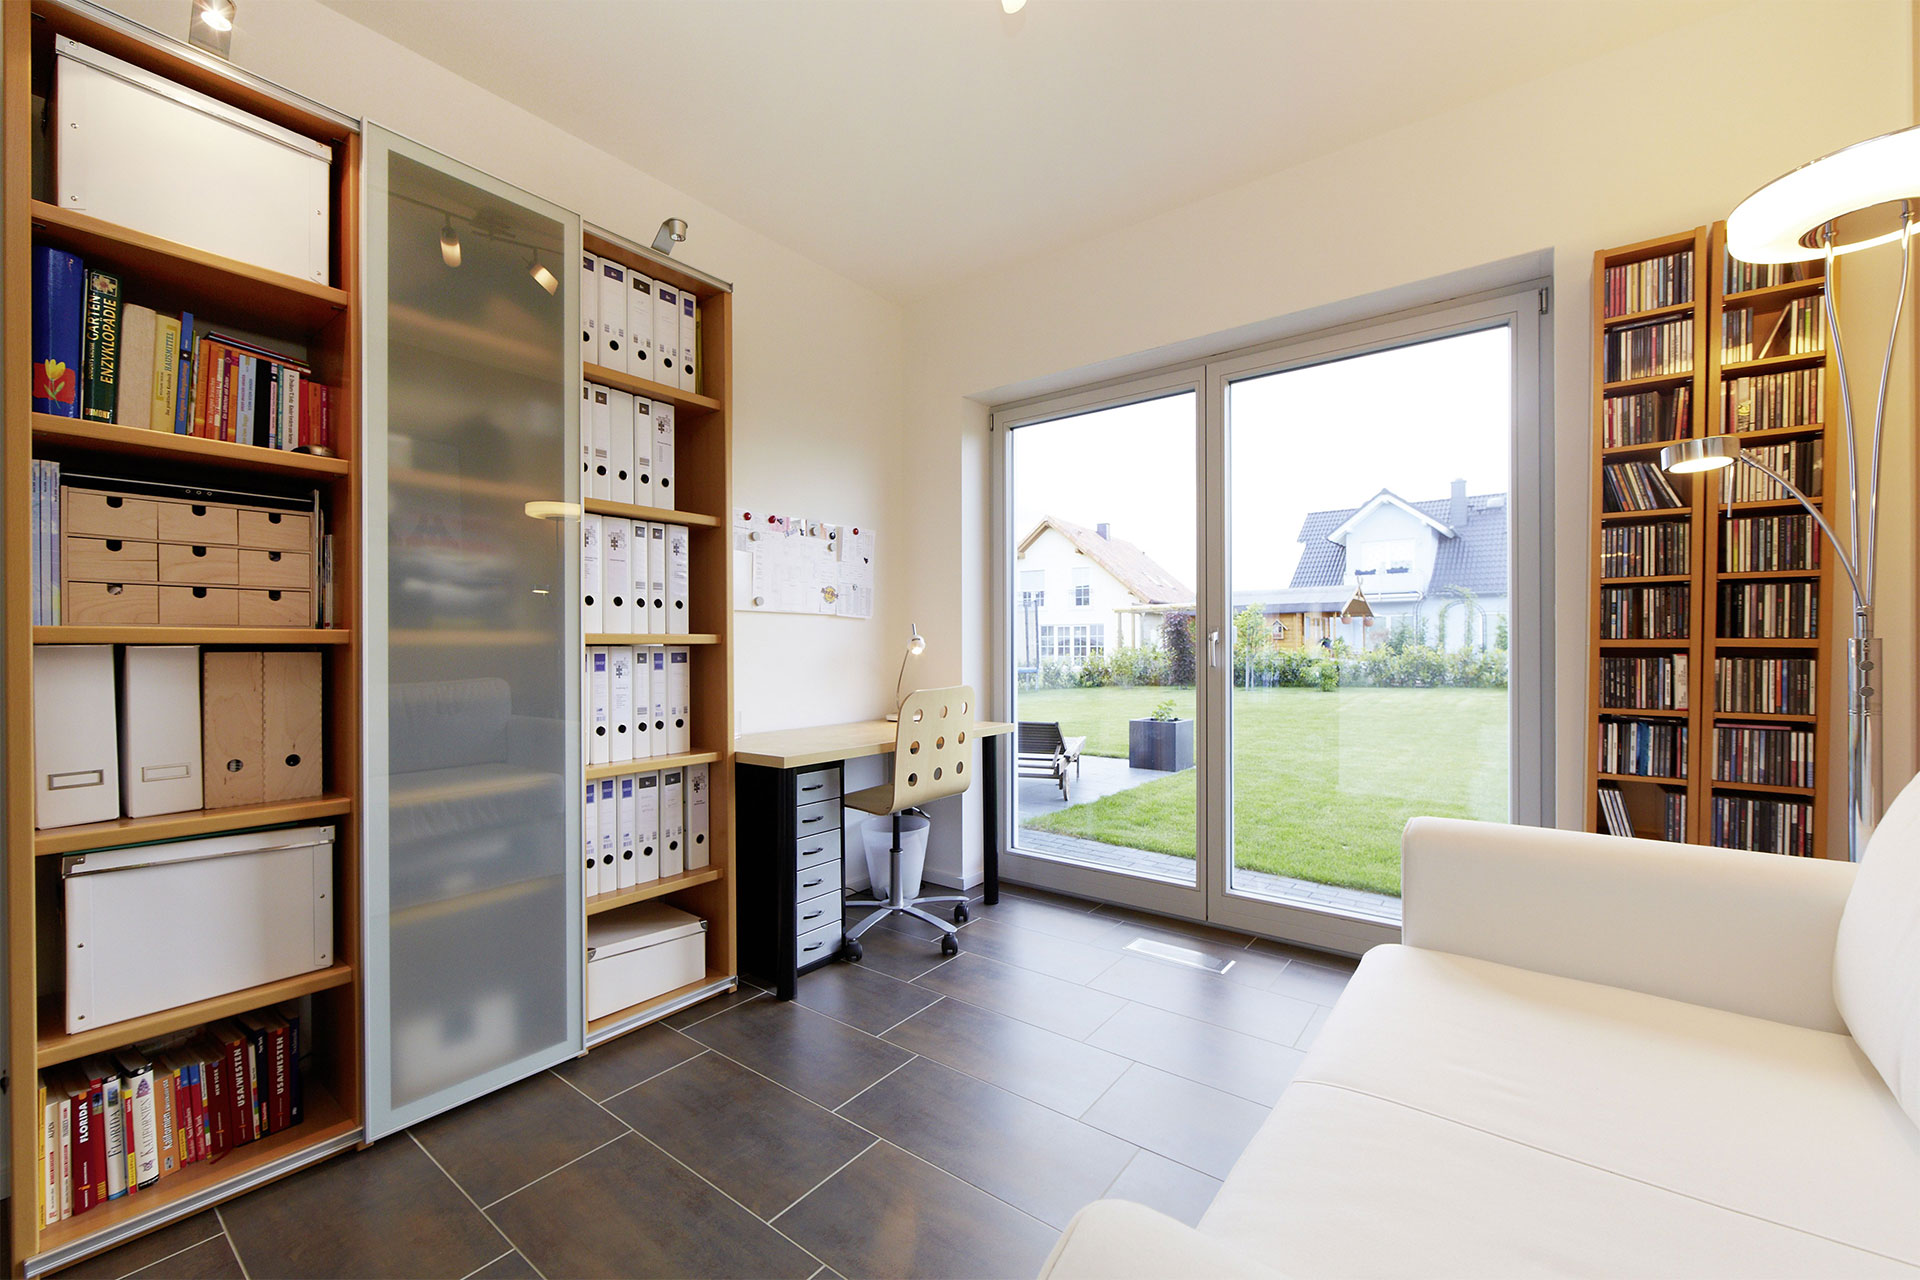 Energieeffizientes Einfamilienhaus individuell geplant - Modell ...